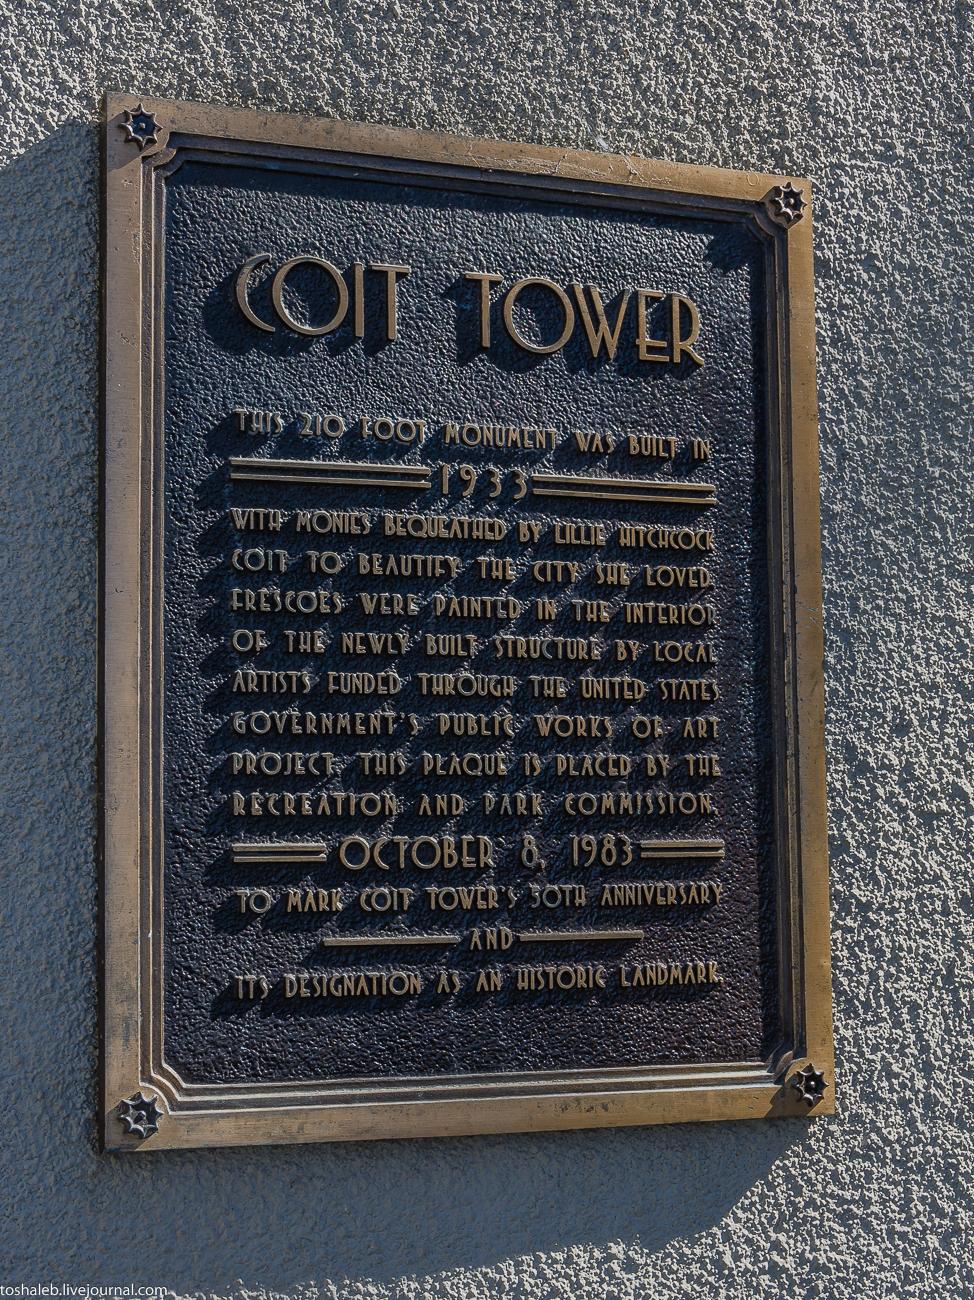 SFO_Coit Tower-81